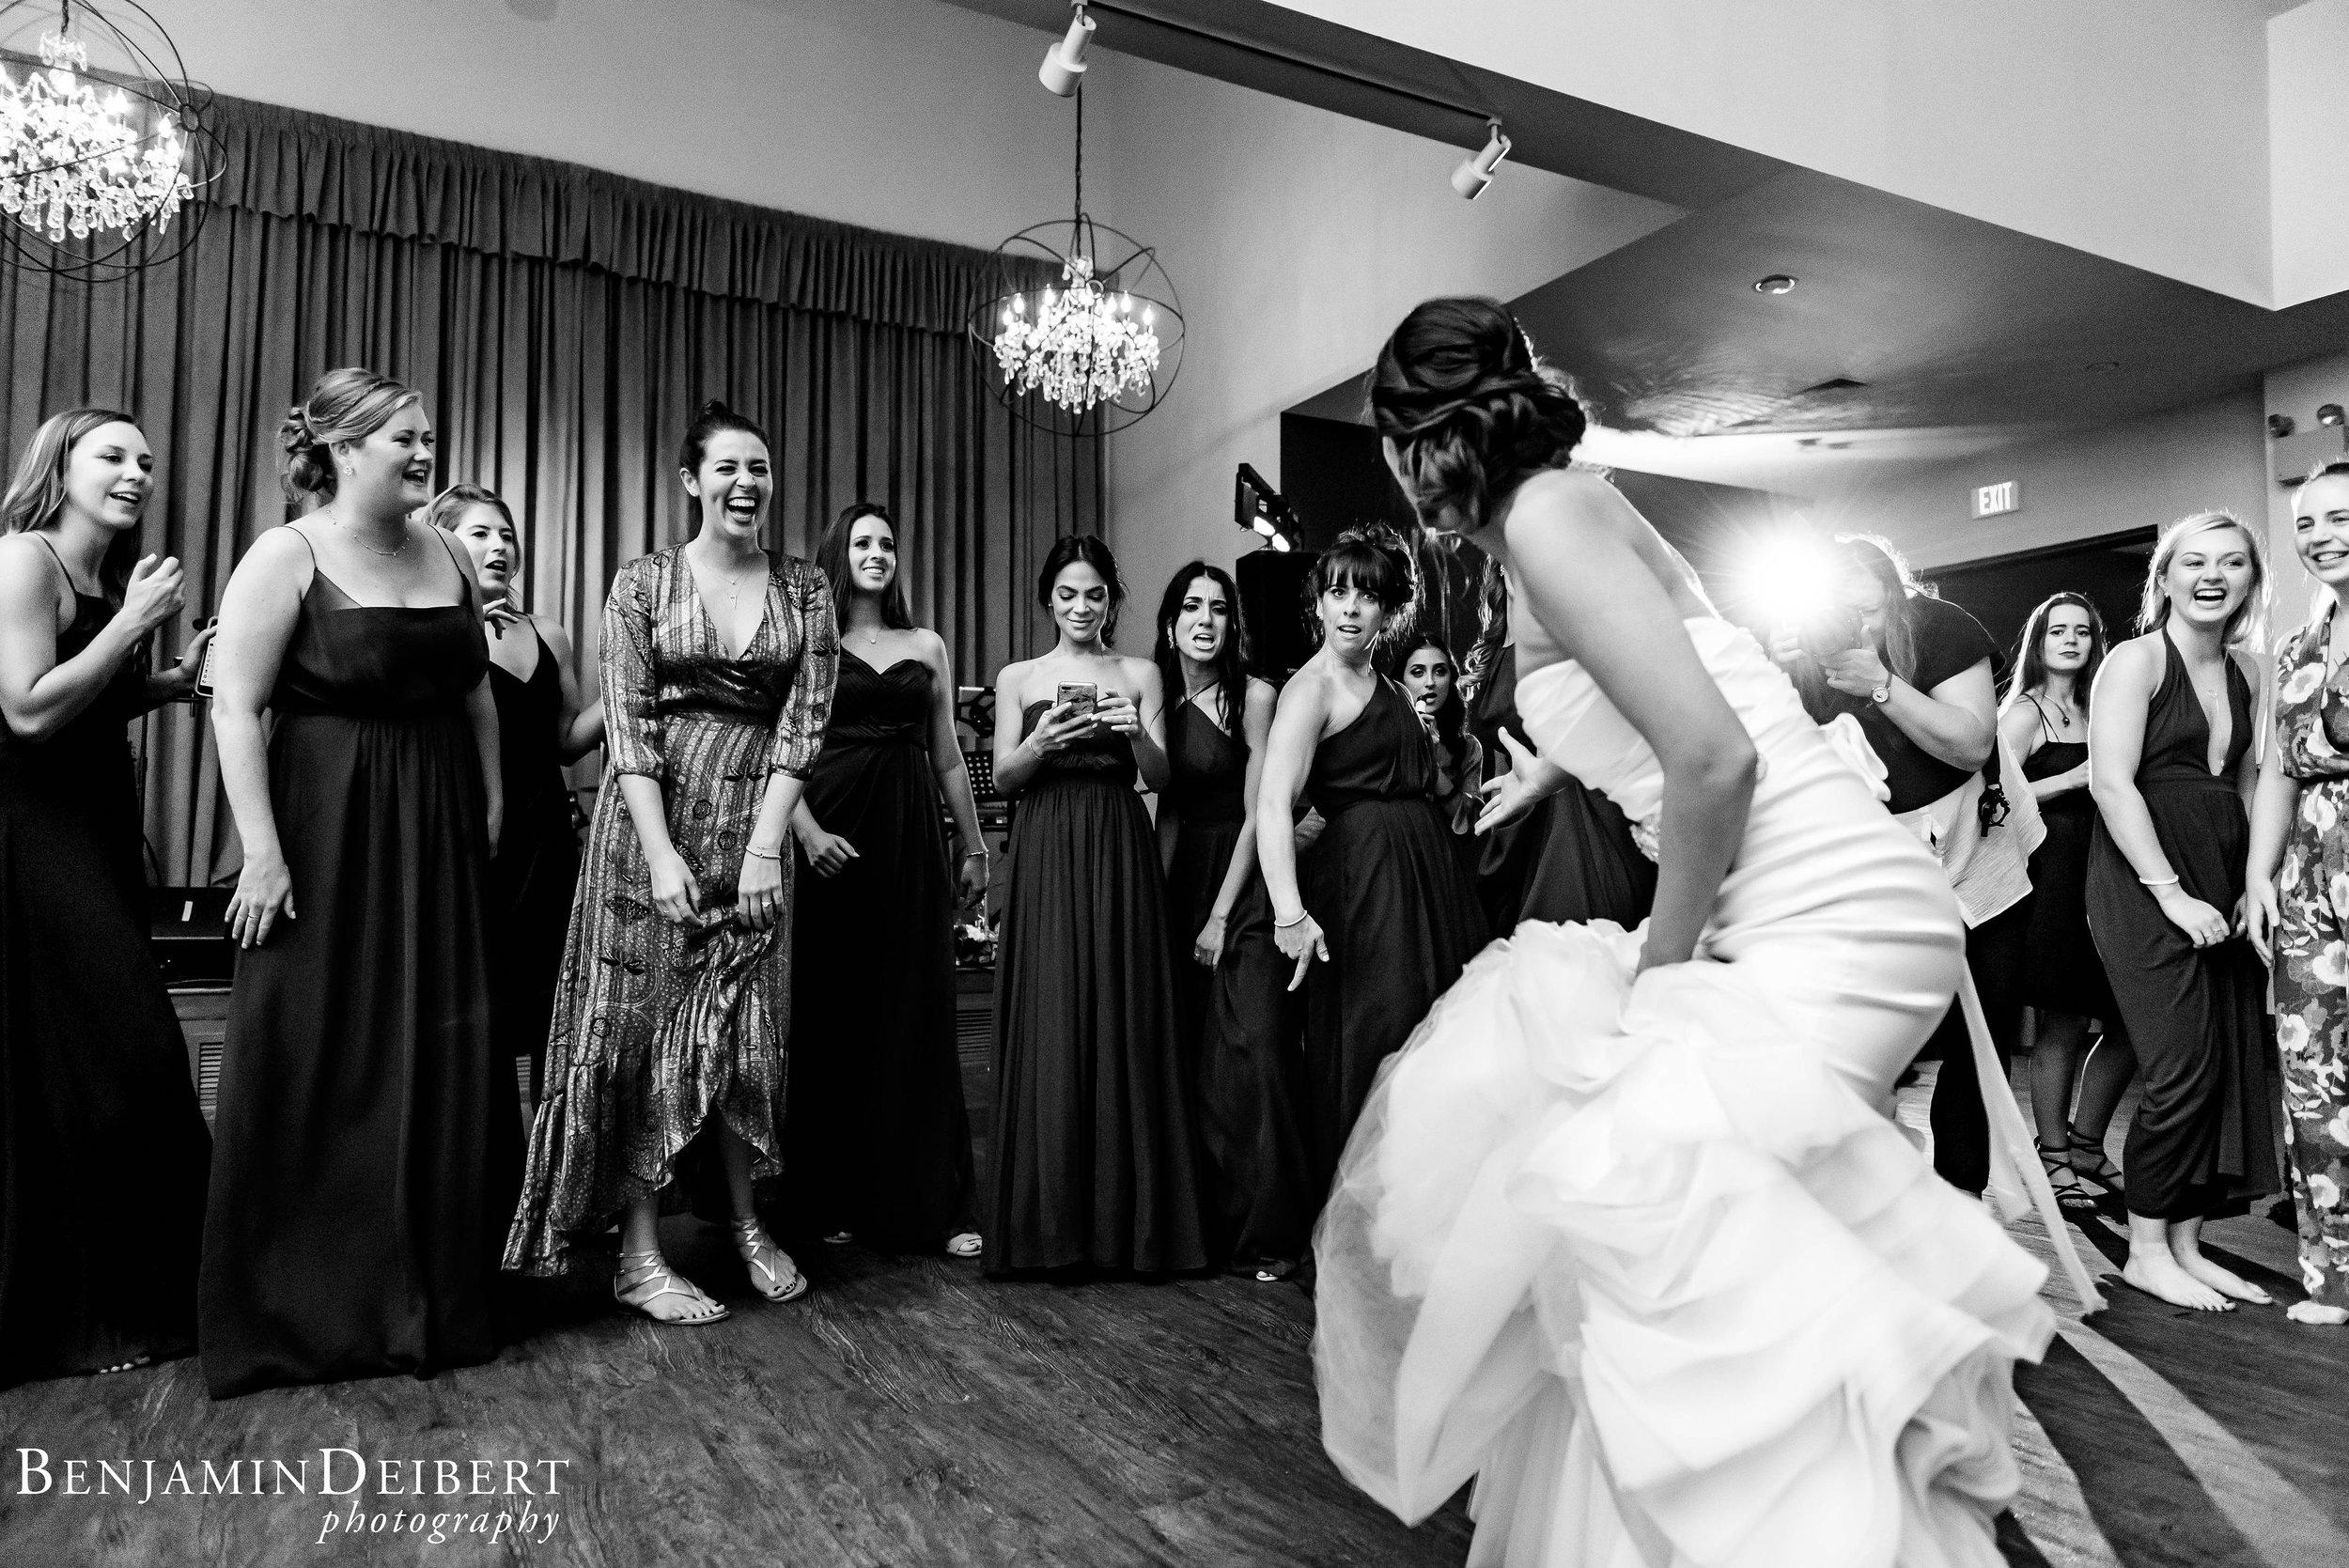 TeghanandChris_BridgemensBallroom_Wedding-148.jpg